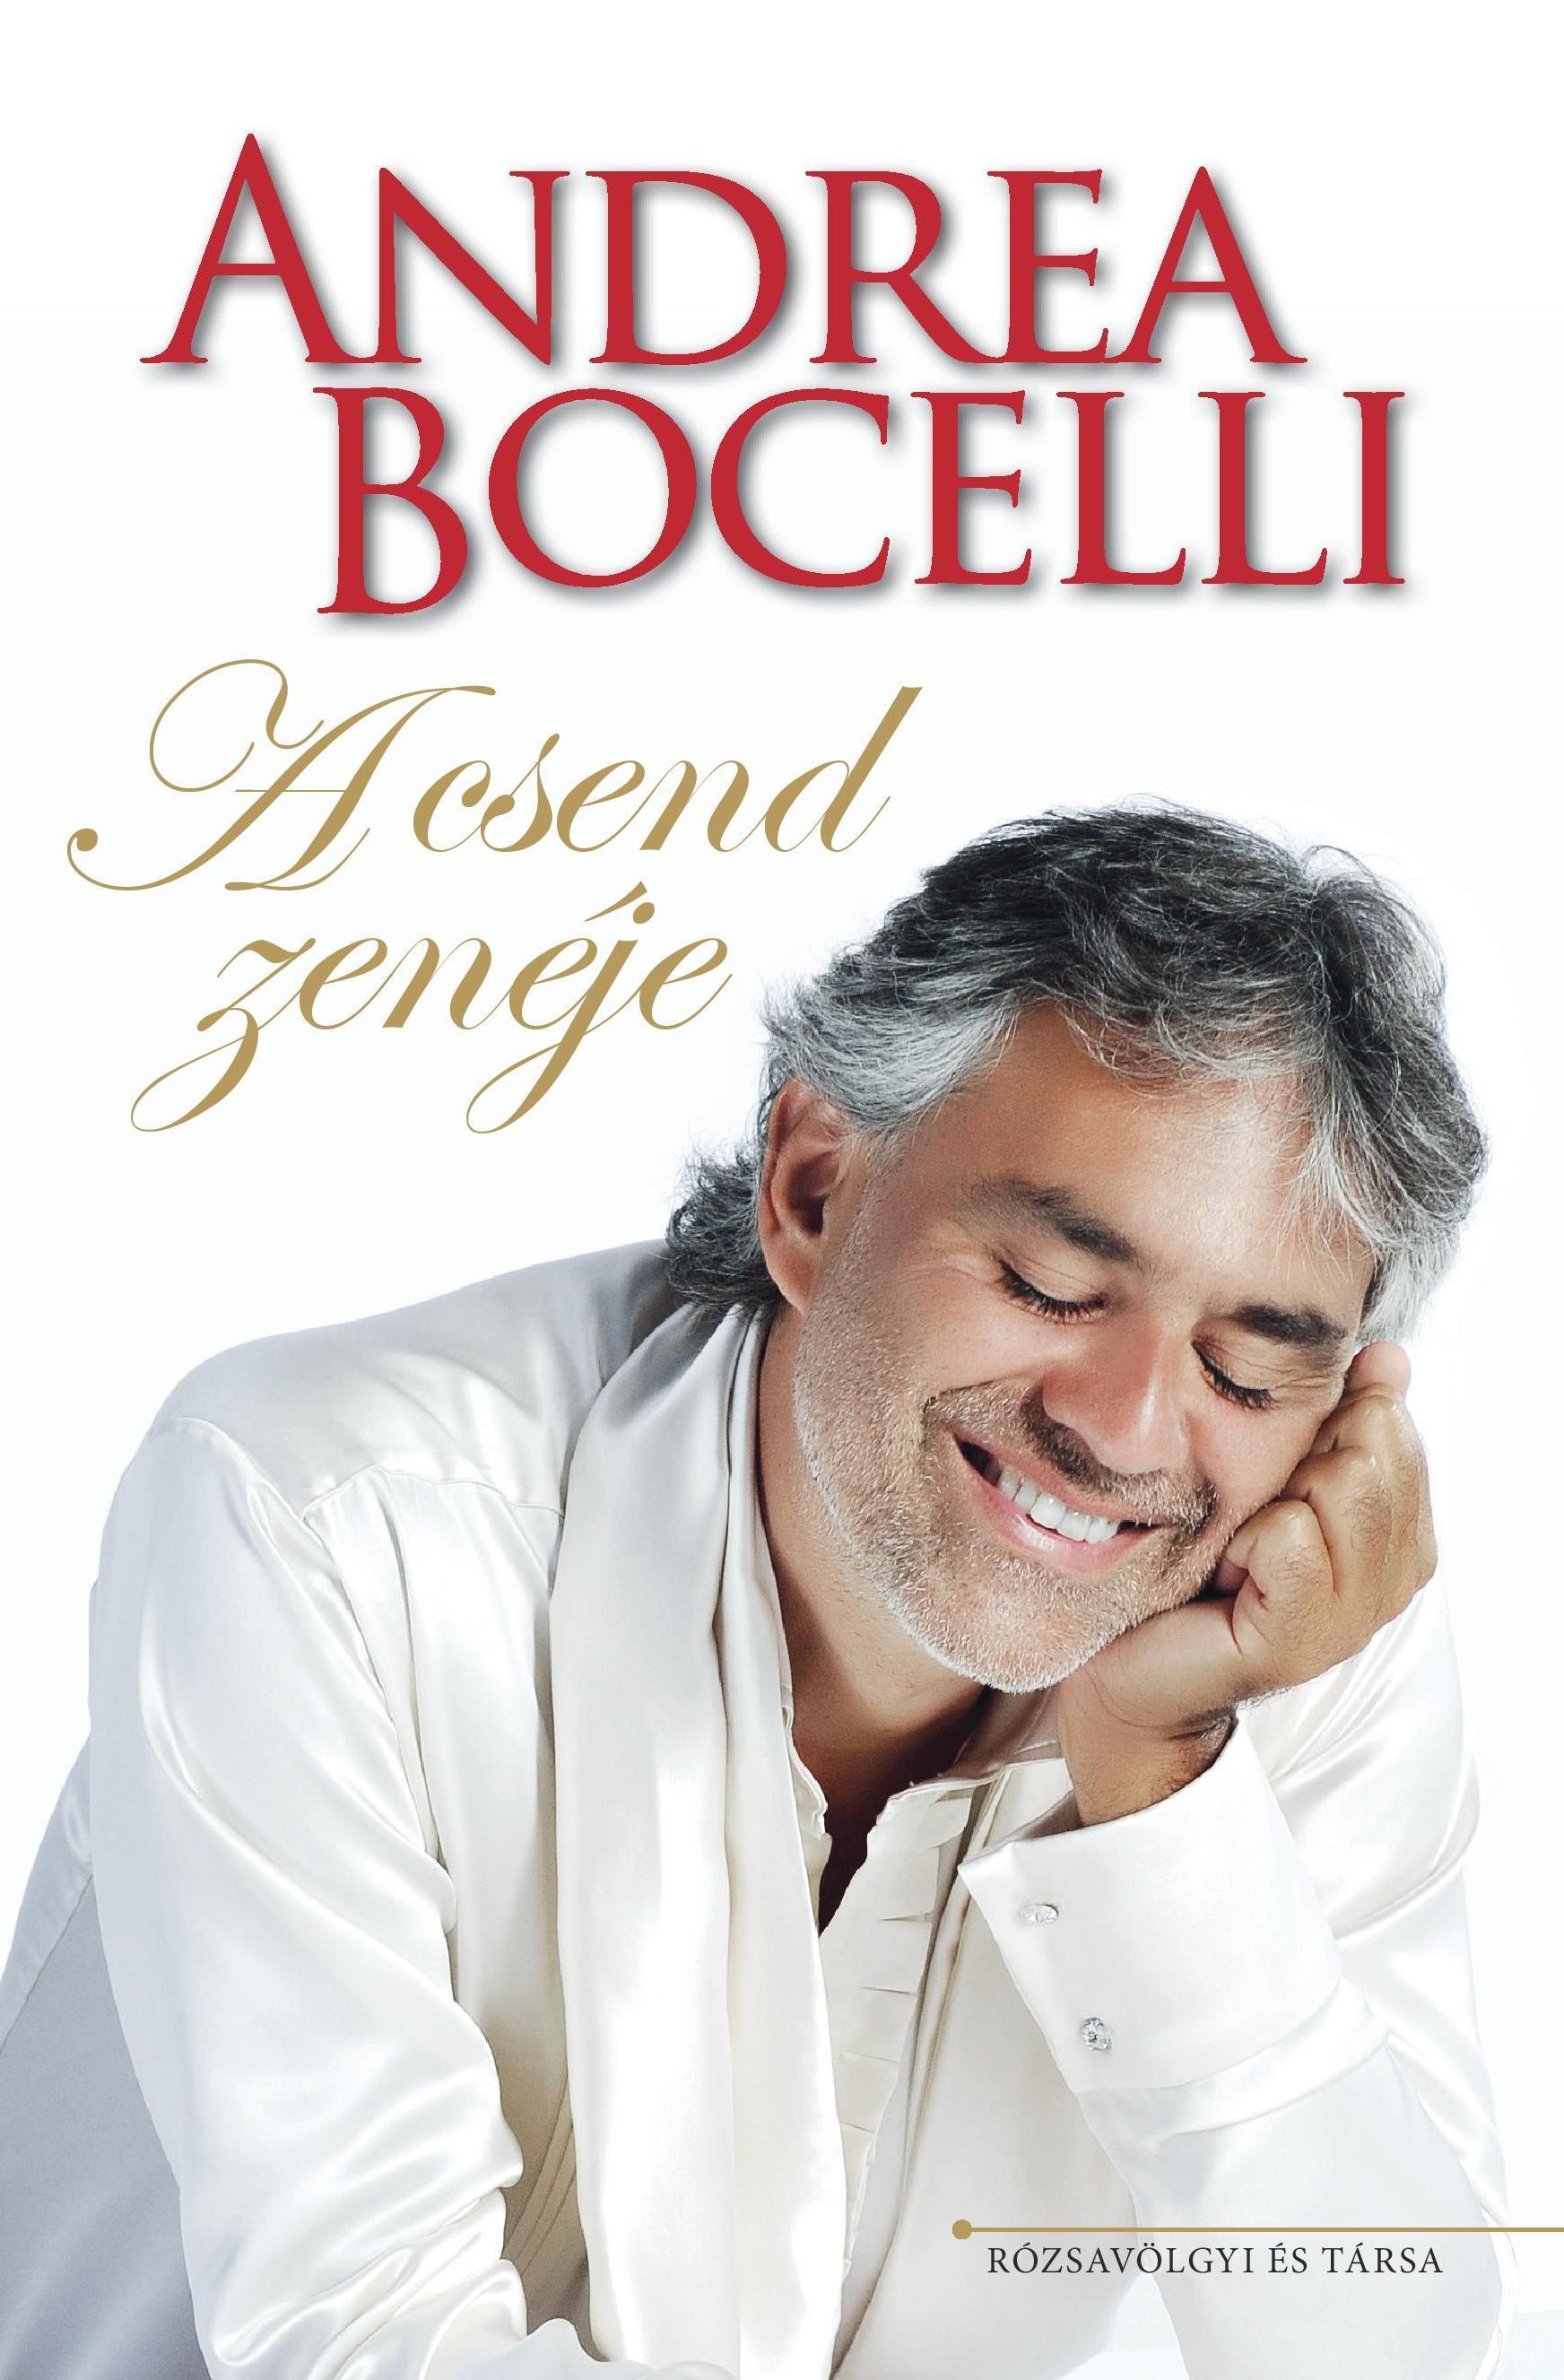 BOCELLI, ANDREA - A CSEND ZENÉJE